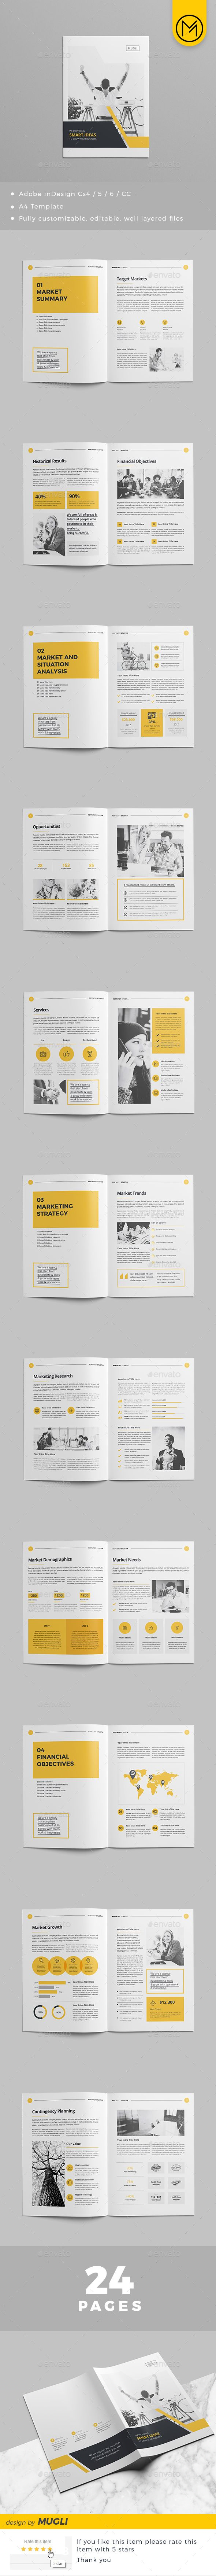 Business Plan | Ofertas